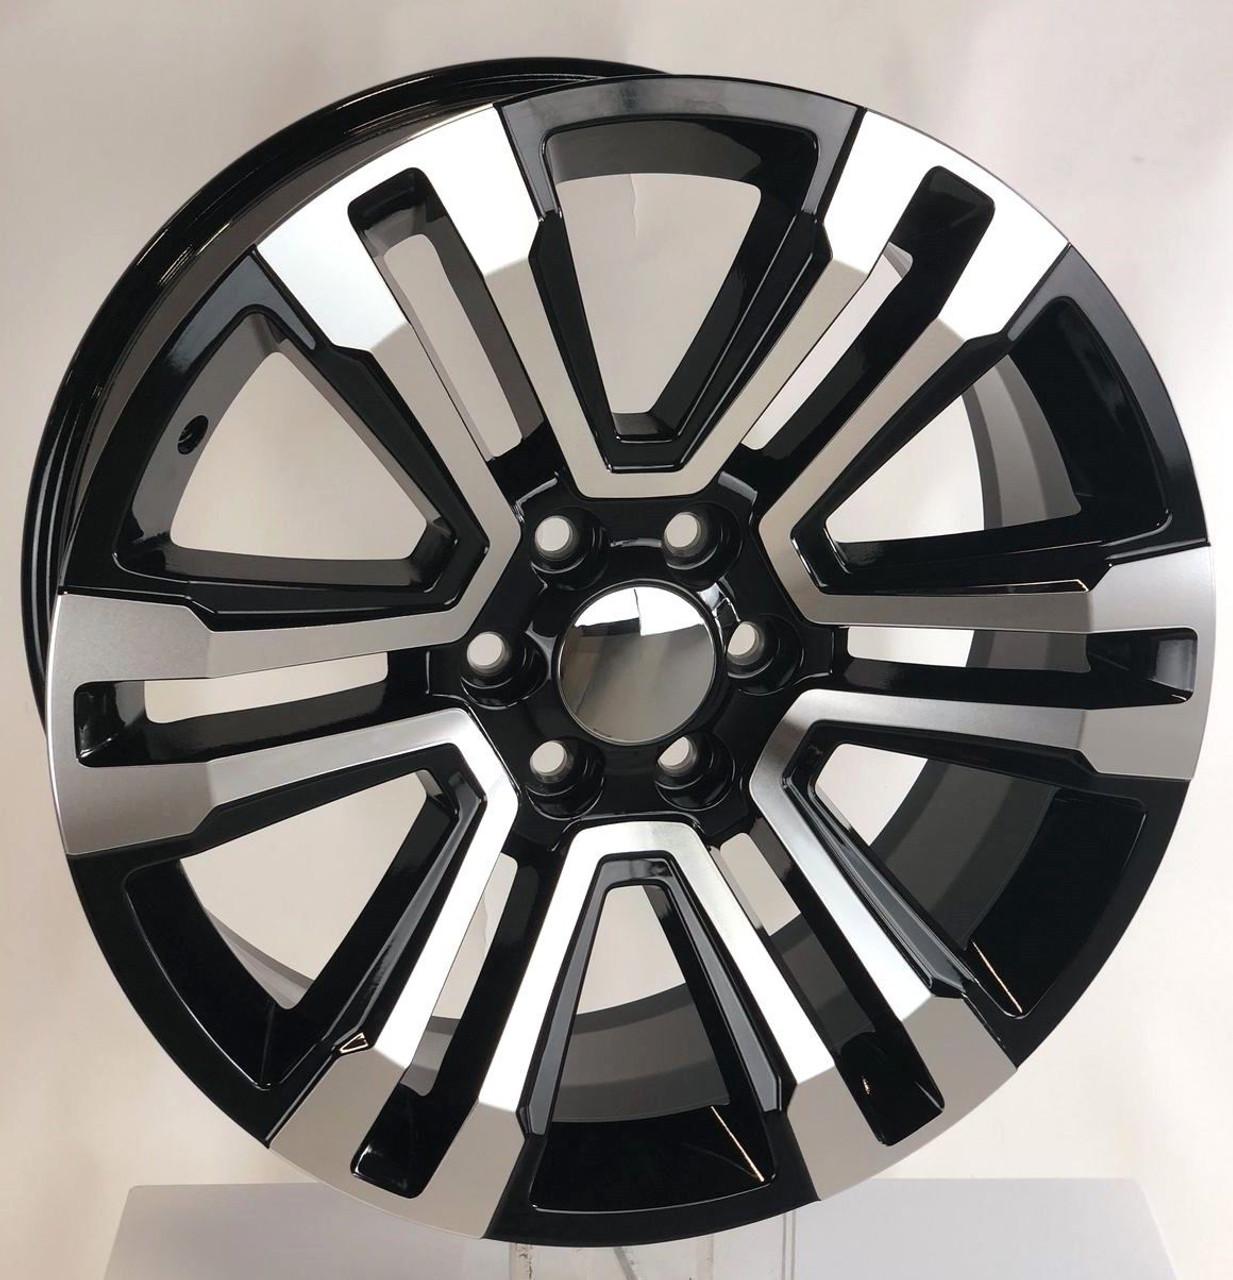 "Black and Machine 22"" Denali Style Split Spoke Wheels for Chevy Silverado, Tahoe, Suburban - New Set of 4"